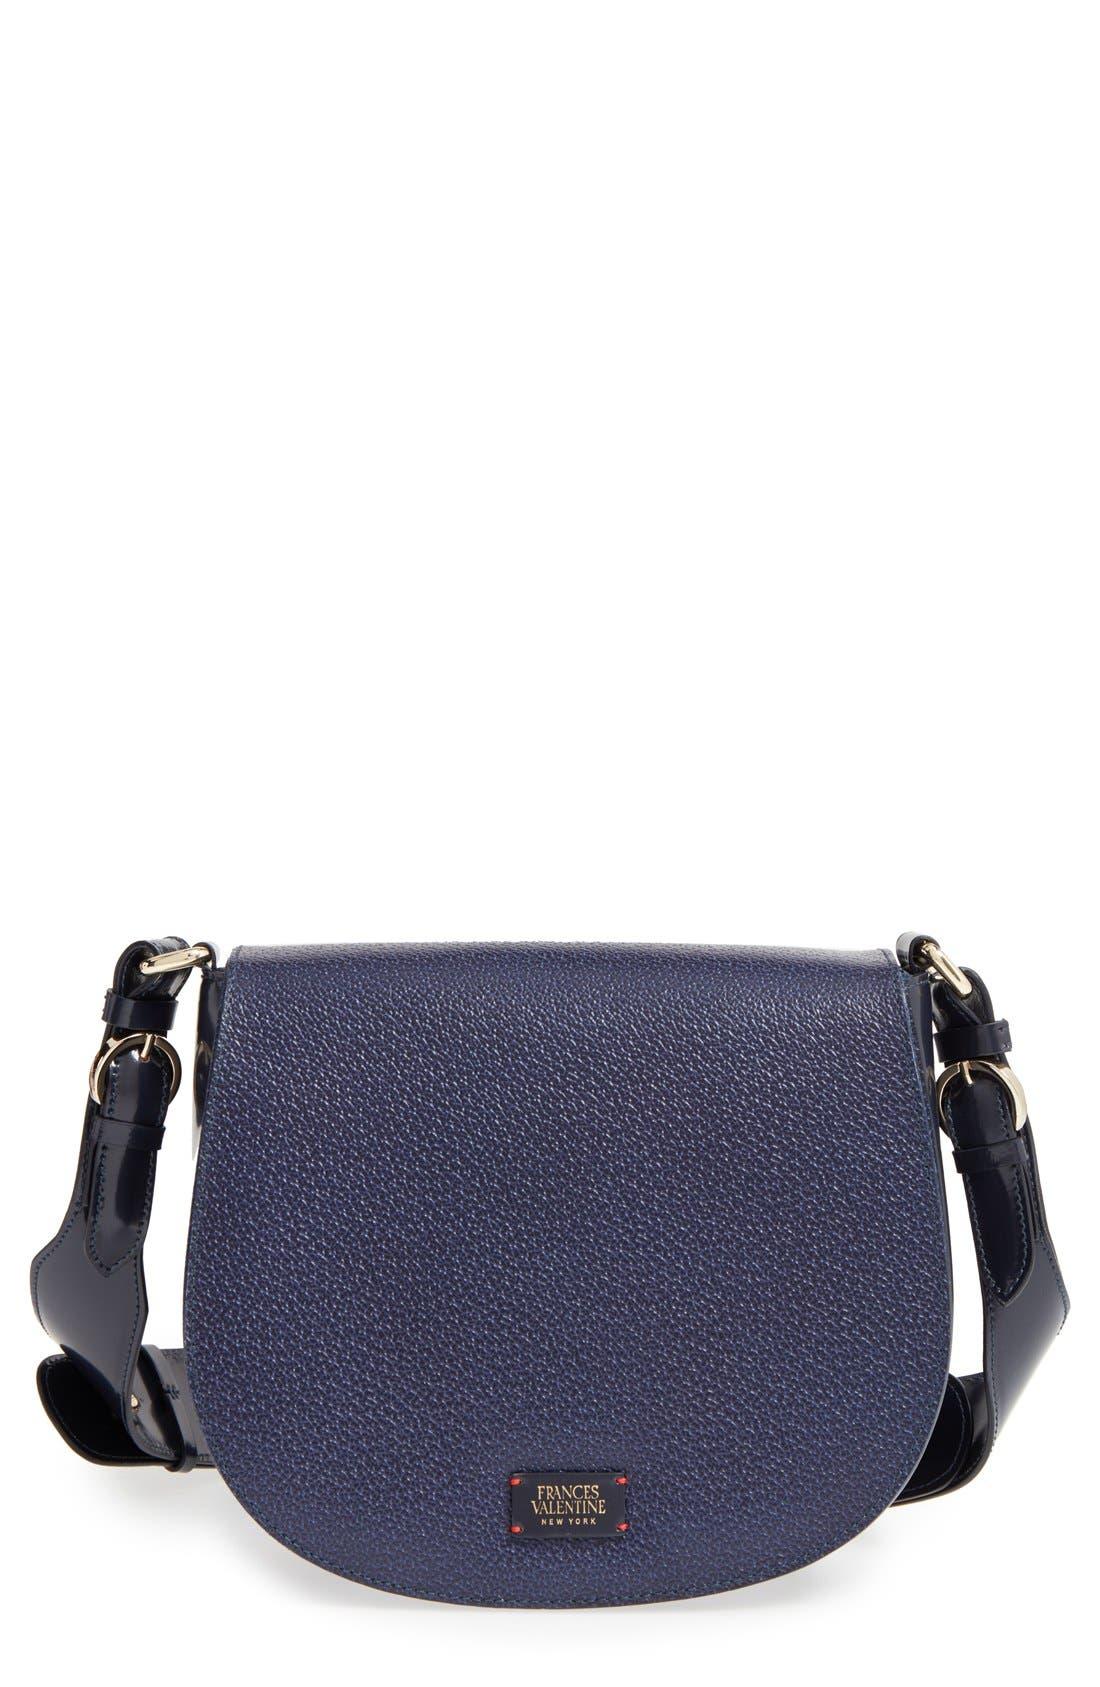 'Small Ellen' Leather Shoulder Bag,                             Main thumbnail 1, color,                             400